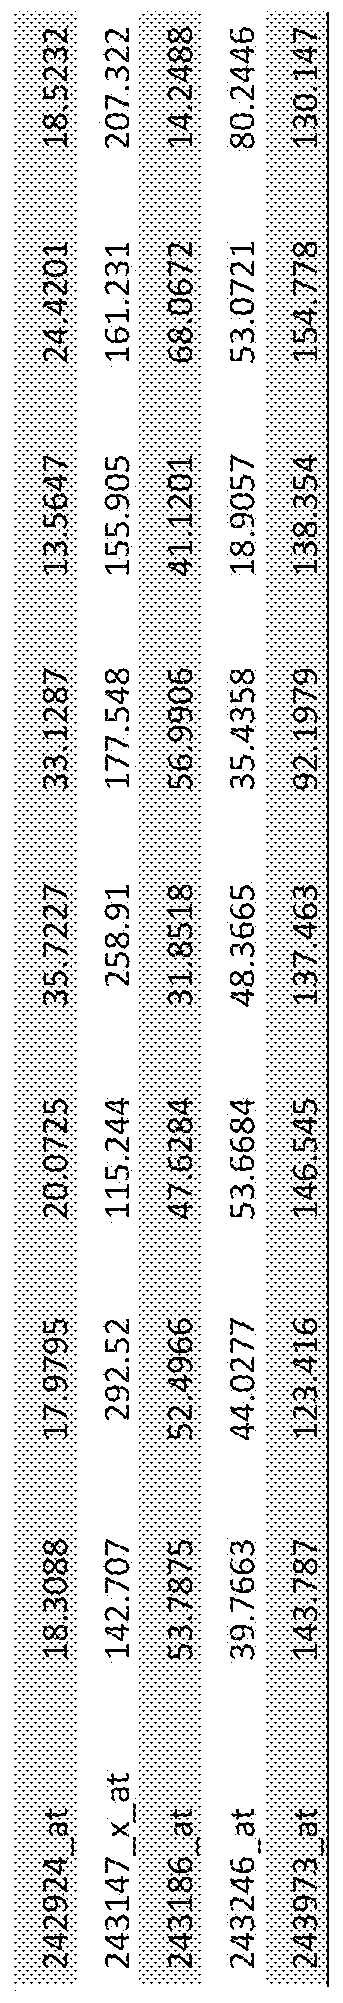 WO2018111104A1 - Use of human crispr sequences in diagnostics - Google  Patents